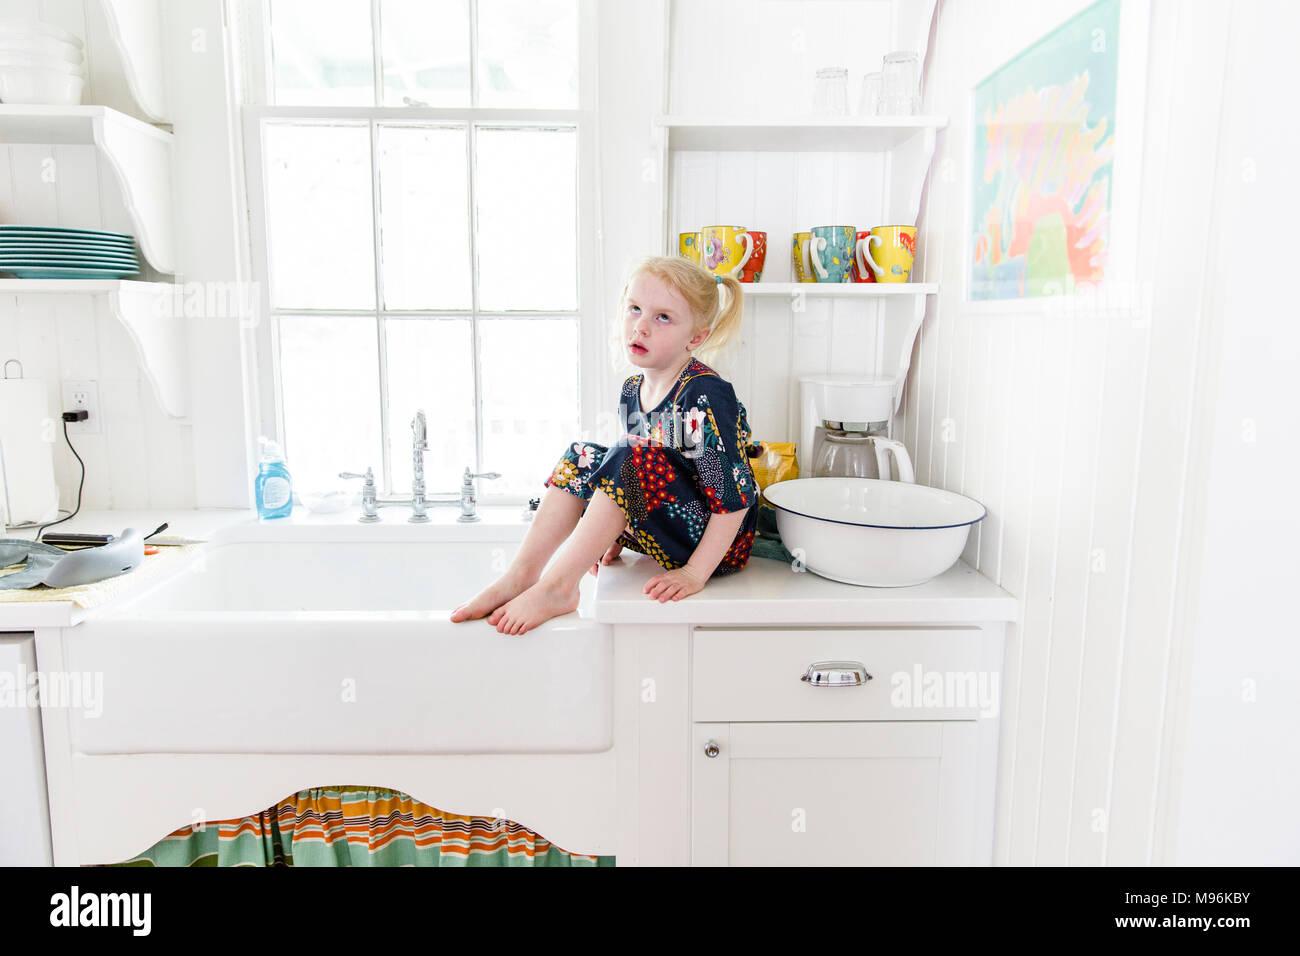 Girl rolling eyes sitting on kitchen worktop - Stock Image